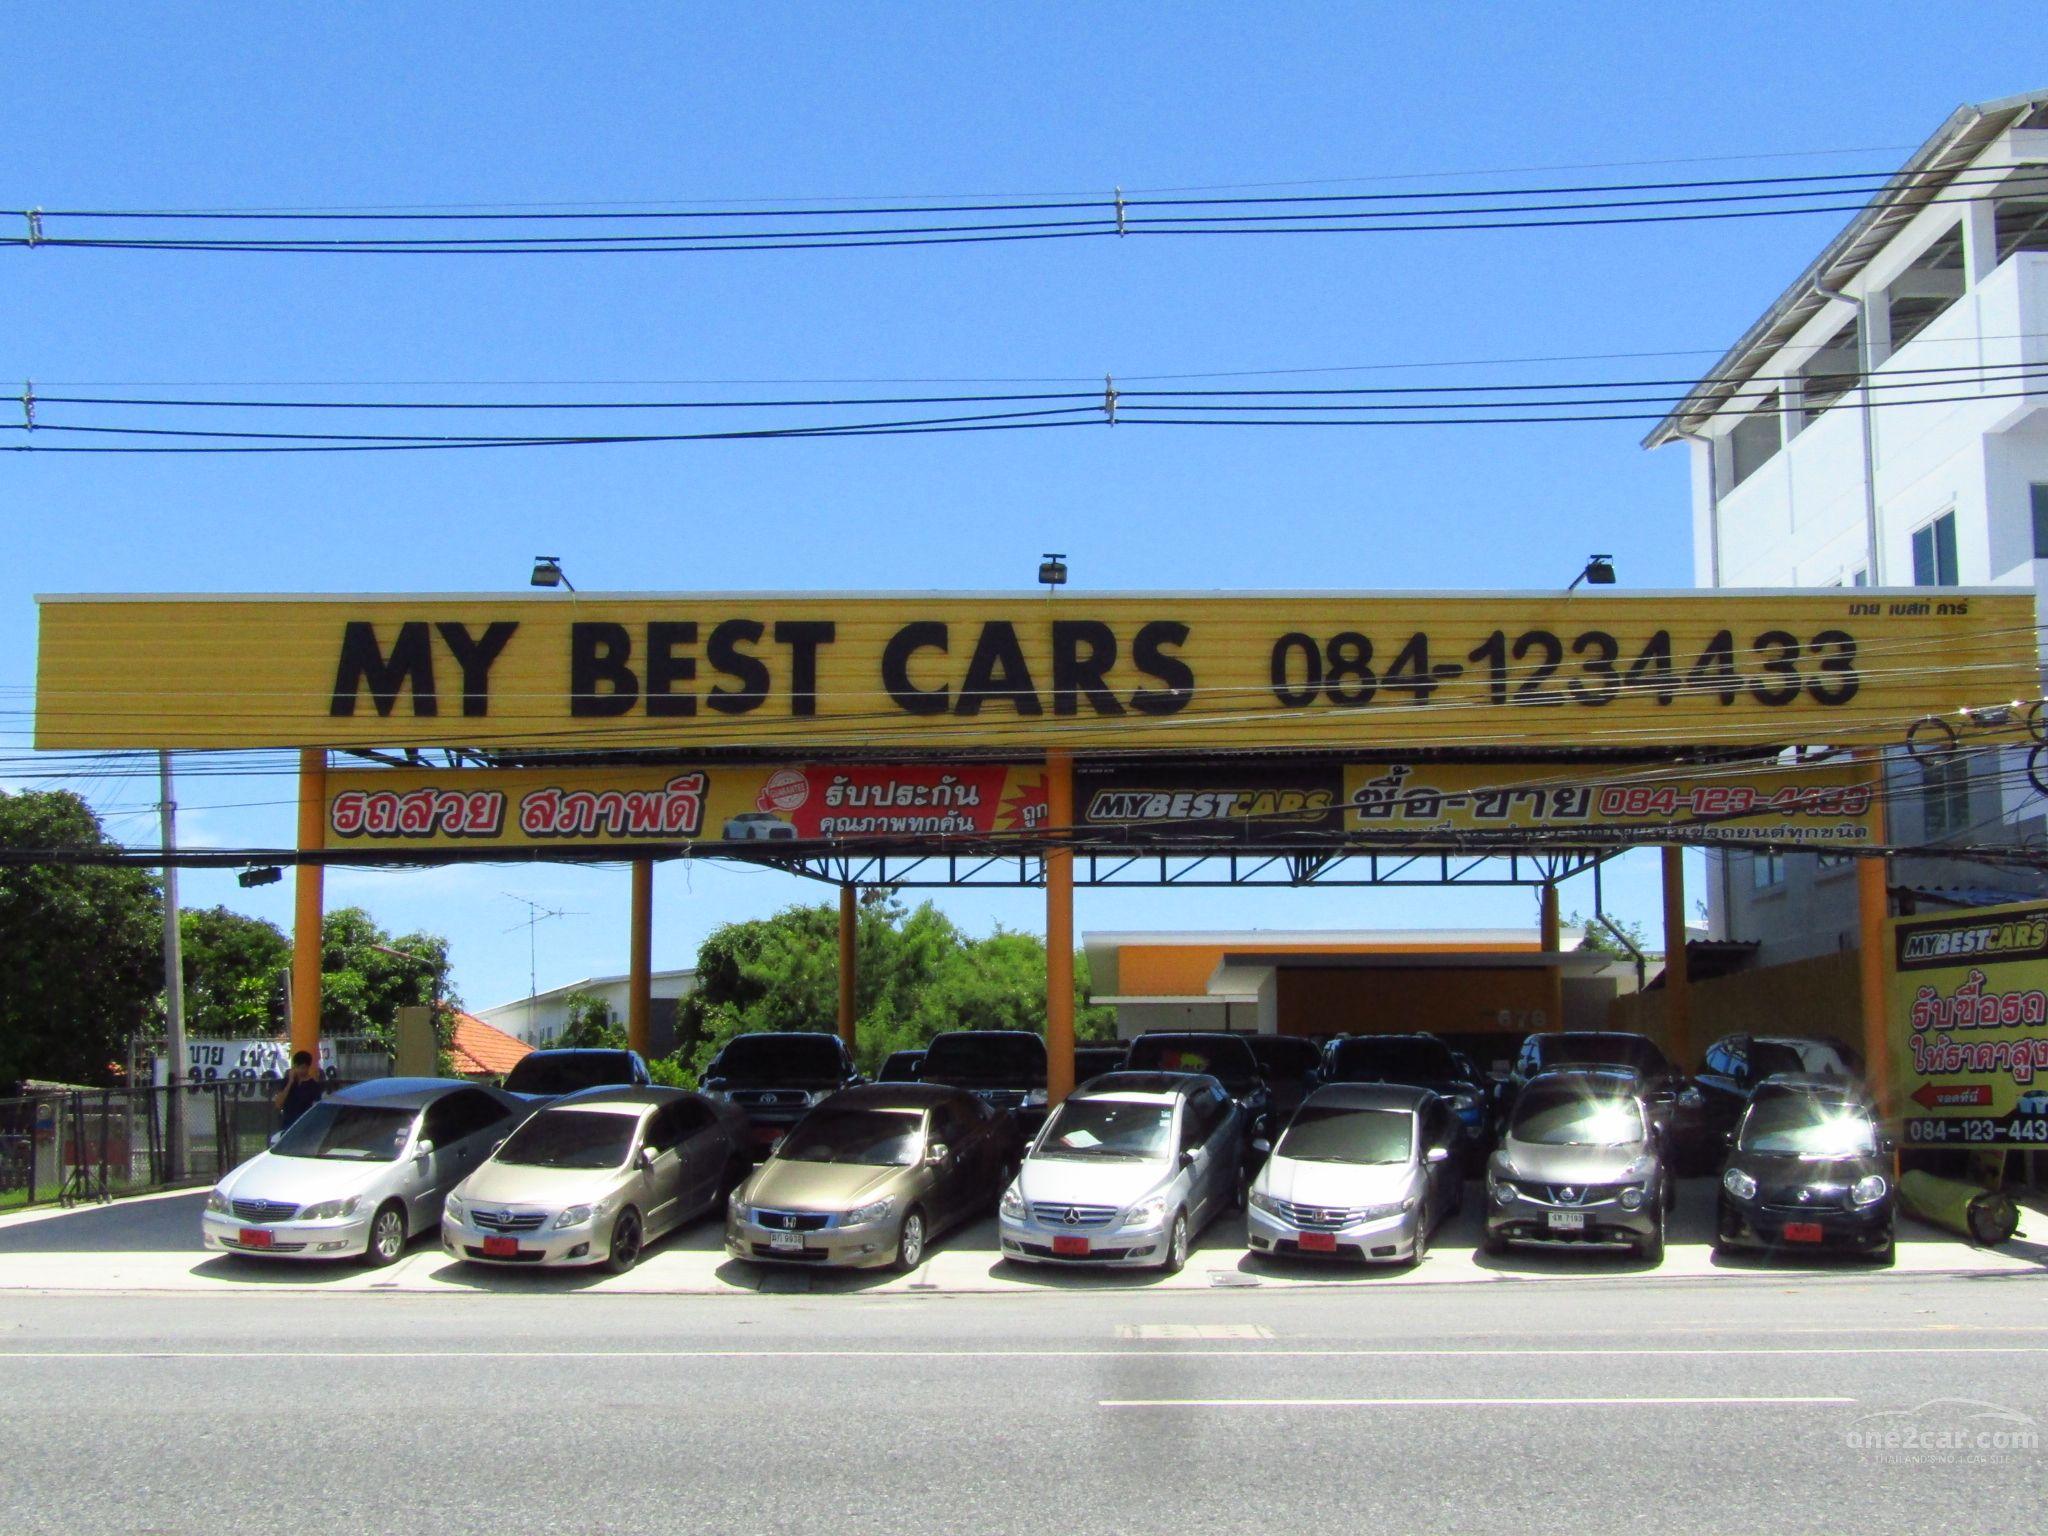 MY BEST CARS